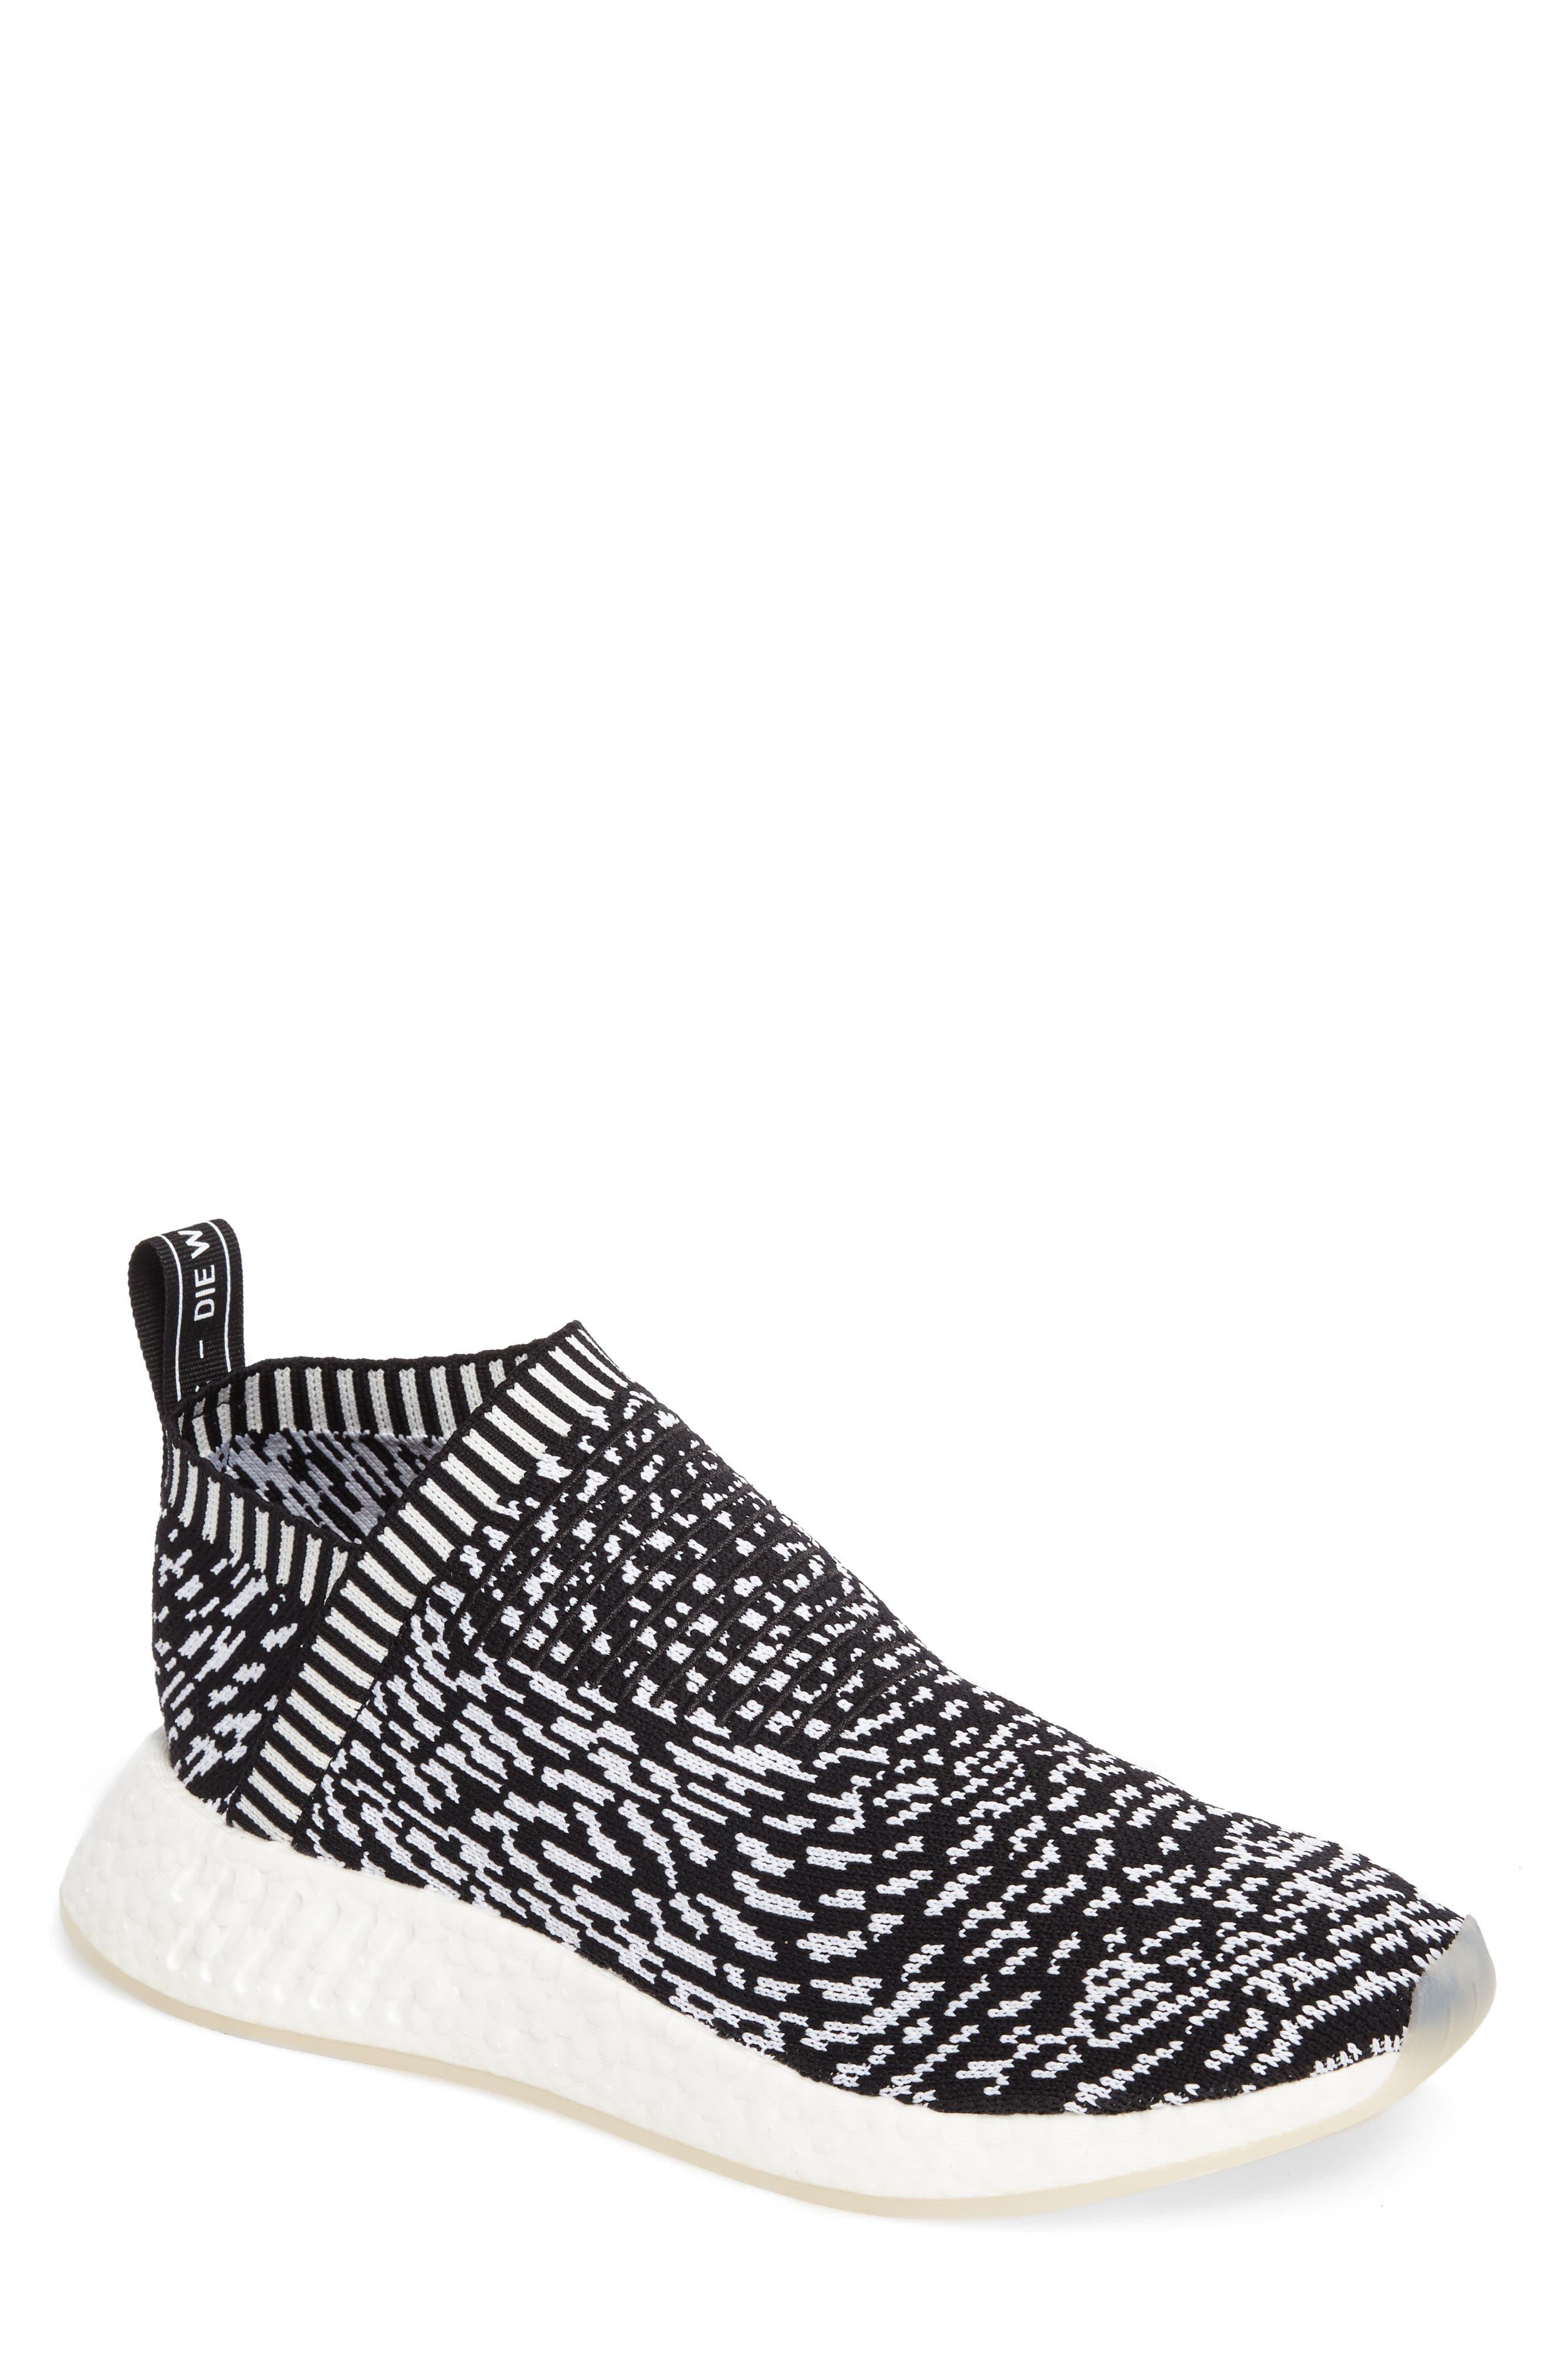 Main Image - adidas NMD_CS2 Primeknit Sneaker (Men)